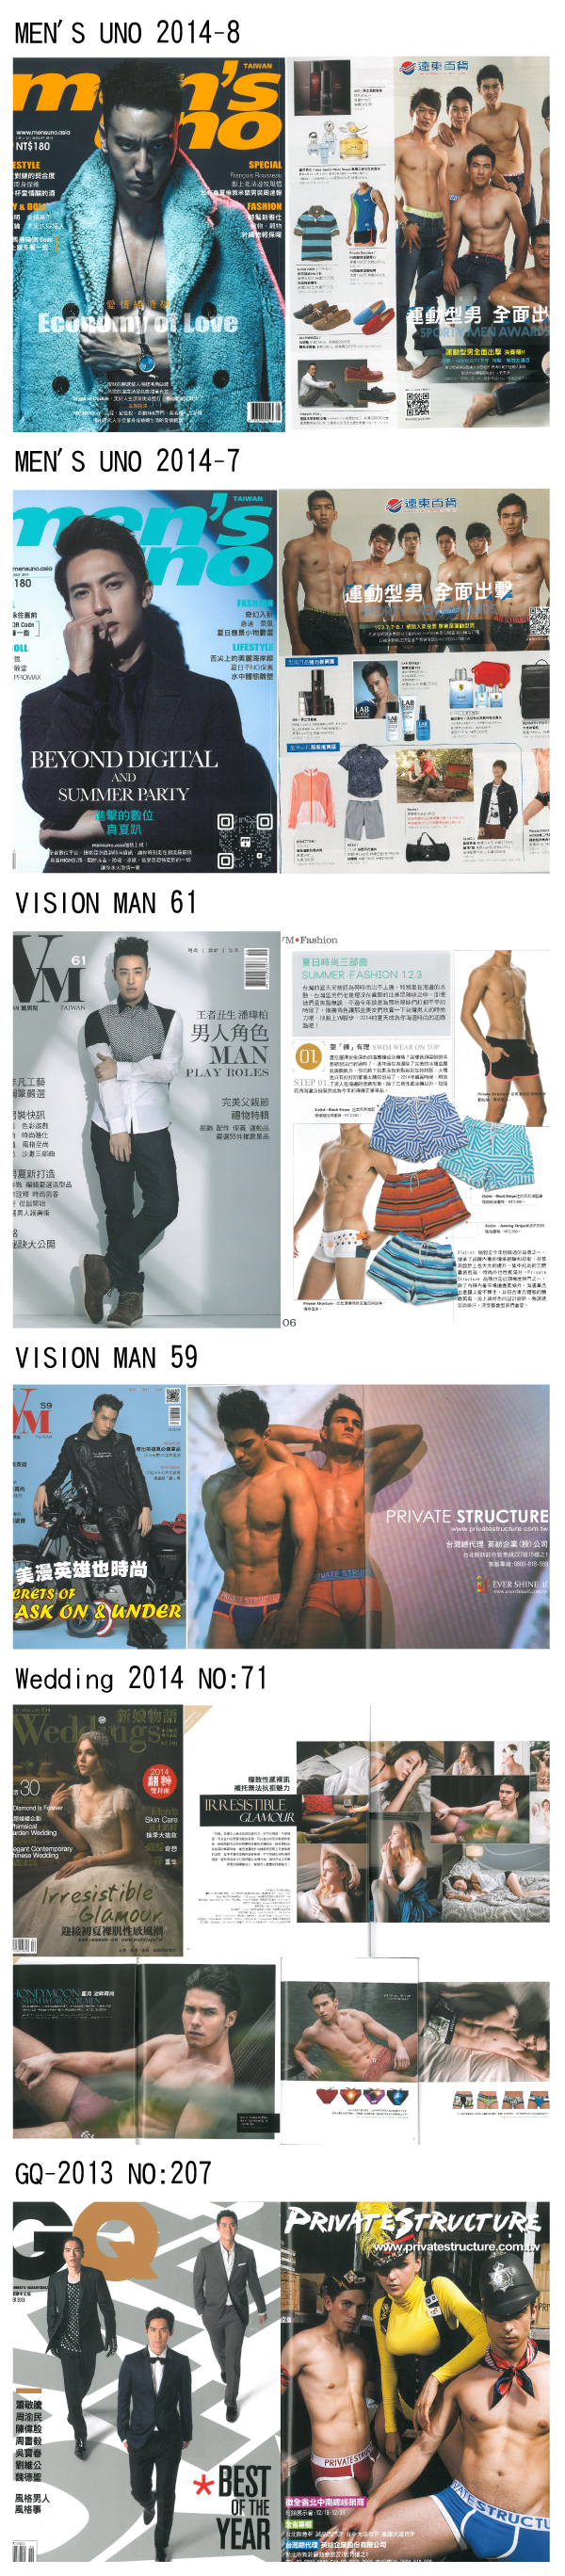 http://www.momoshop.com.tw/expertimg/0003/613/956/ps-magazine.jpg?t=1441707286535?t=1444070269